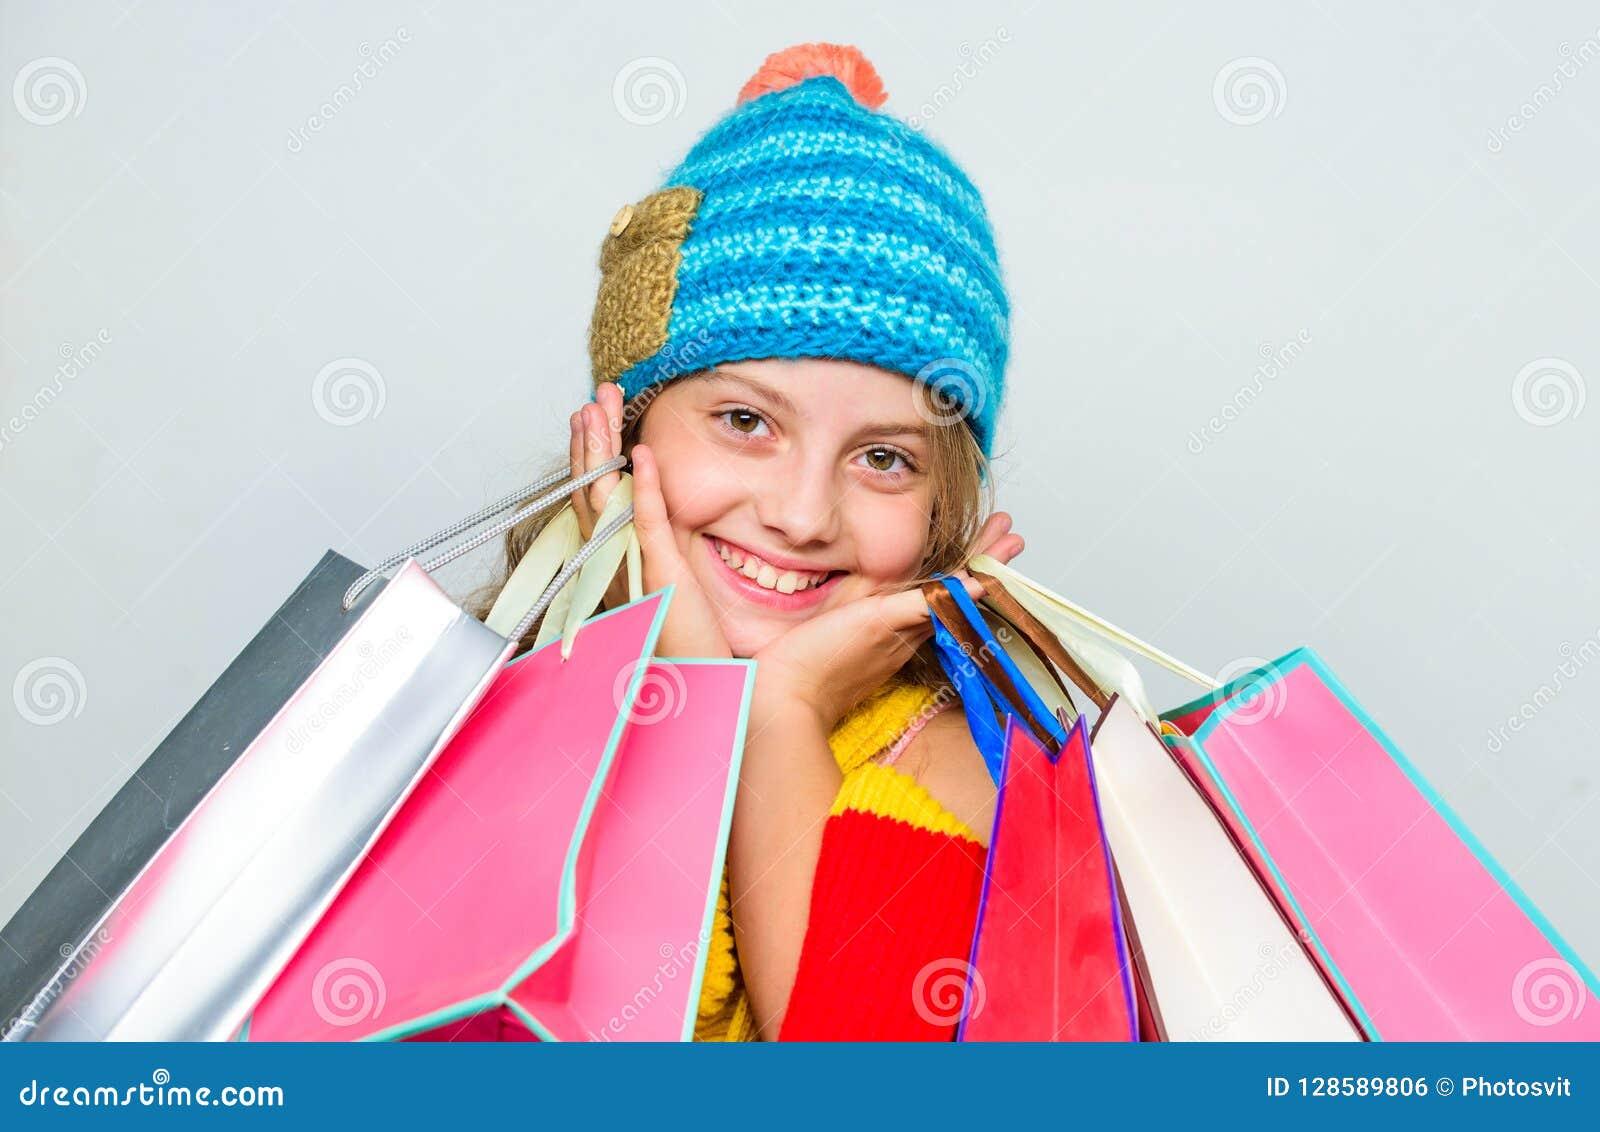 39de9cca07647 Amazing Shopping Concept. Buy Clothes Amazing Discount. Get Promo ...